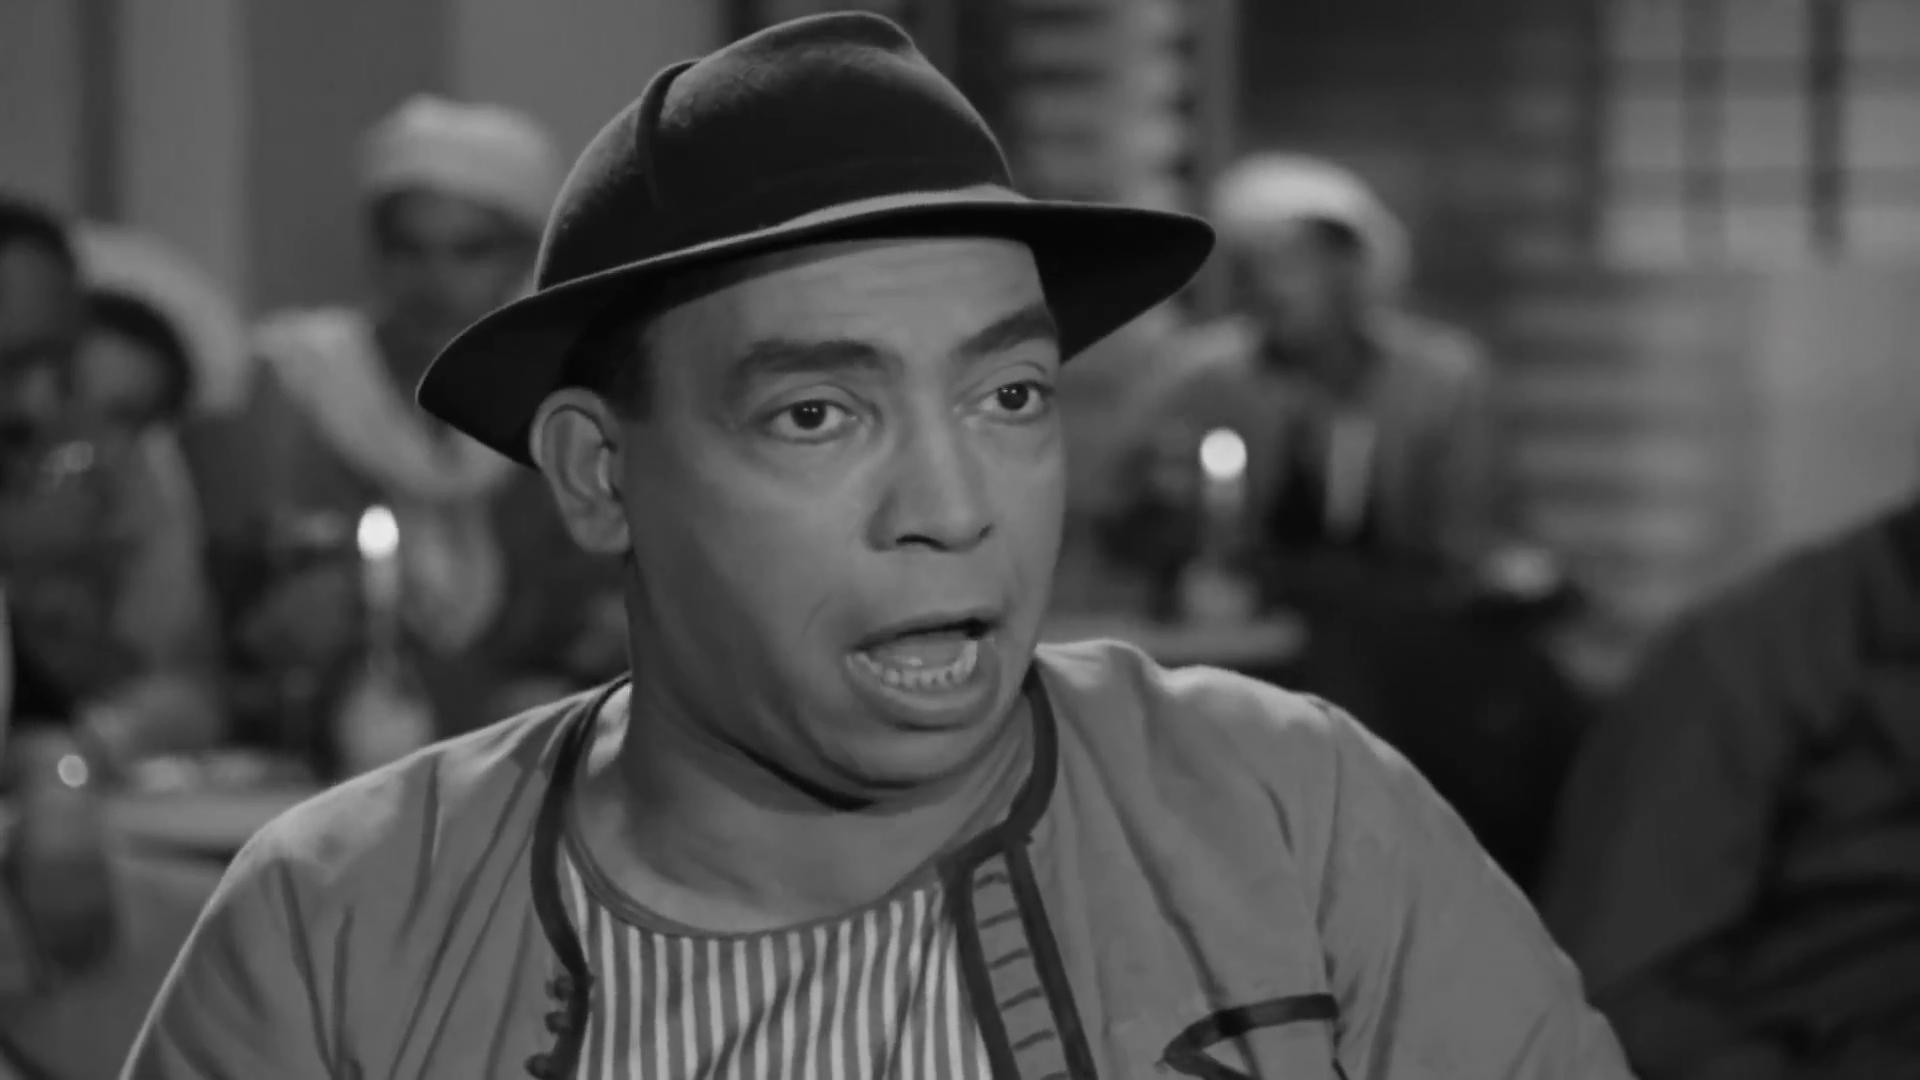 [فيلم][تورنت][تحميل][ابن حميدو][1957][1080p][Web-DL] 11 arabp2p.com